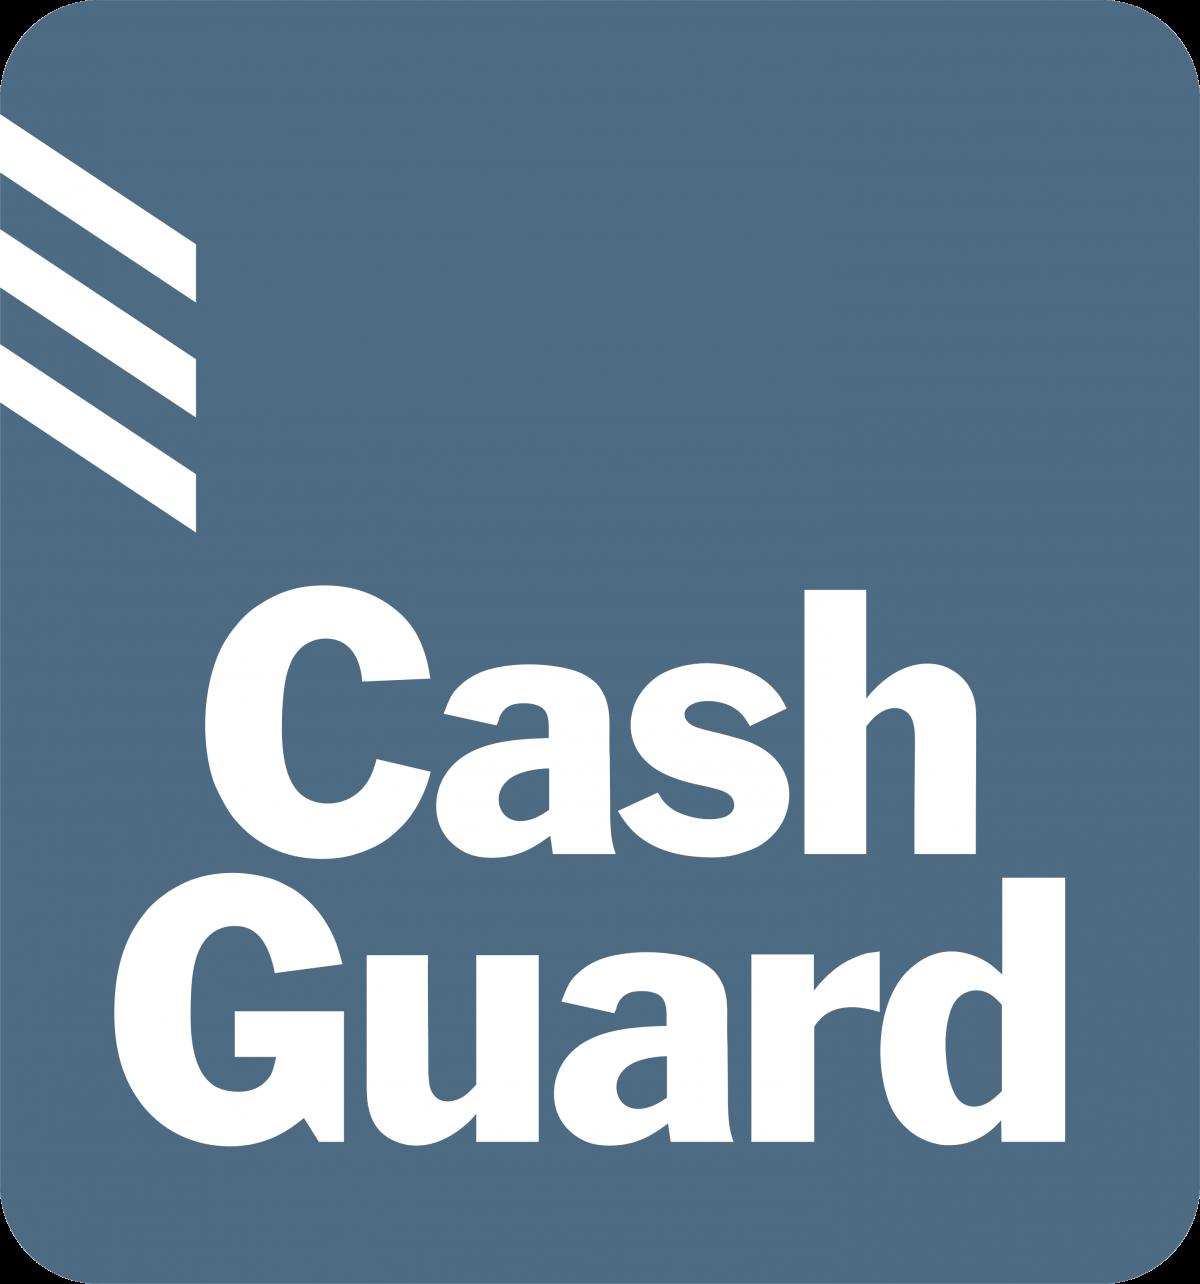 CASHGUARD-LOGO-OFICIAL-PNG-1200x1284